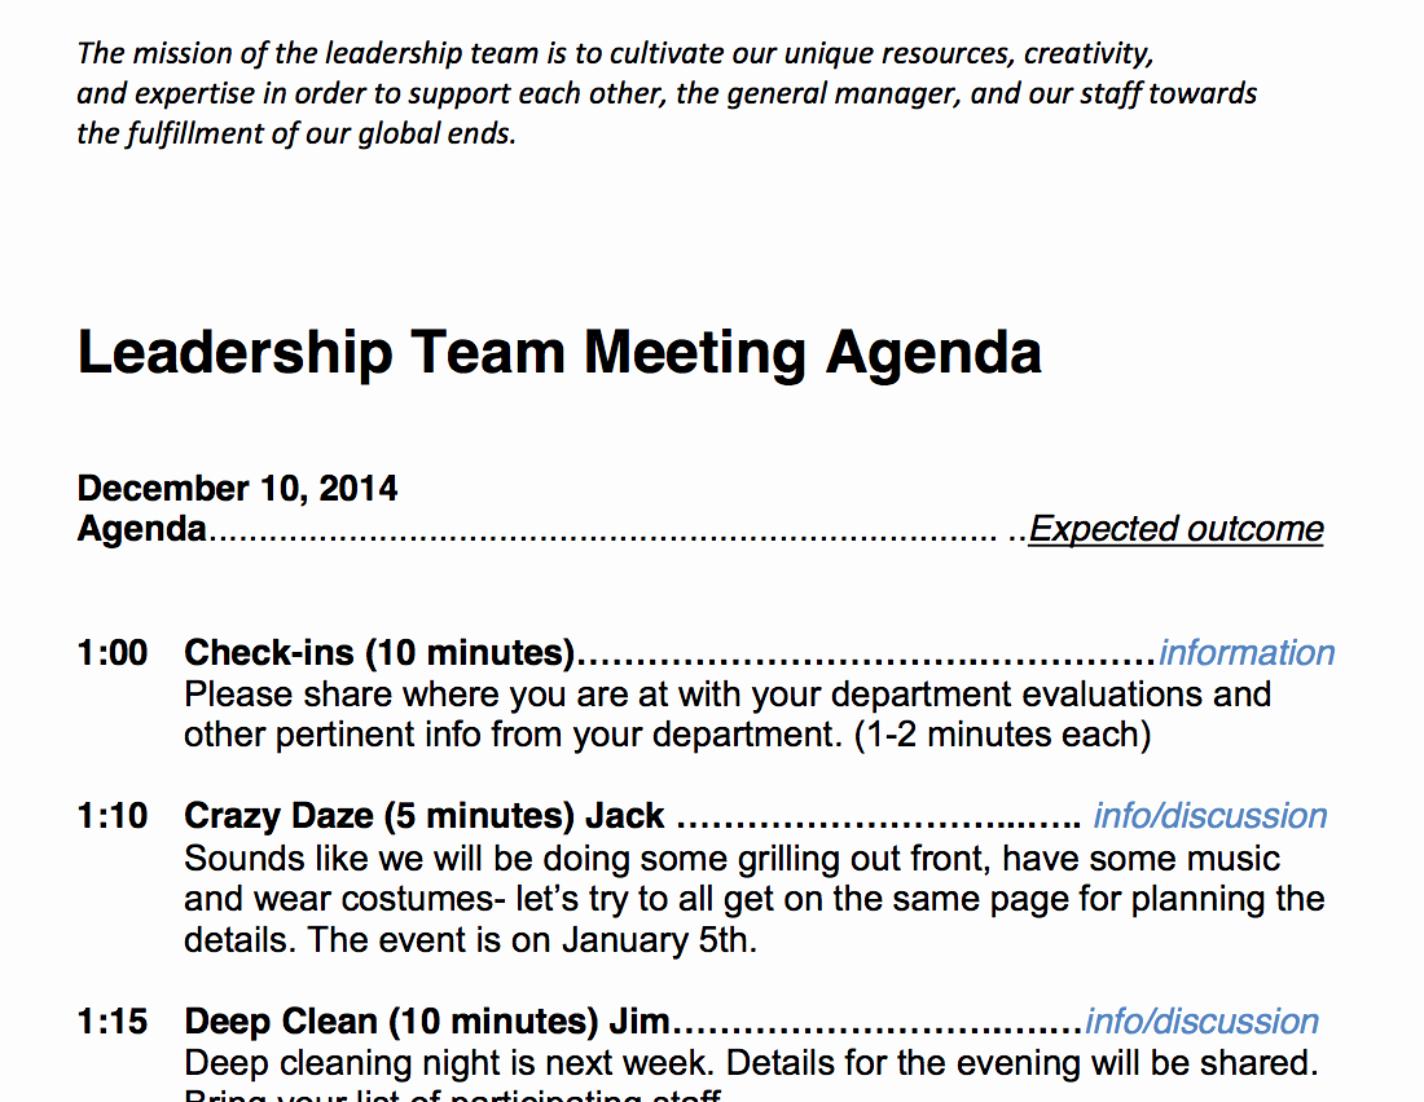 Sample Of A Meeting Agenda Fresh Team Meeting Agenda Sample – Cds Cc Library